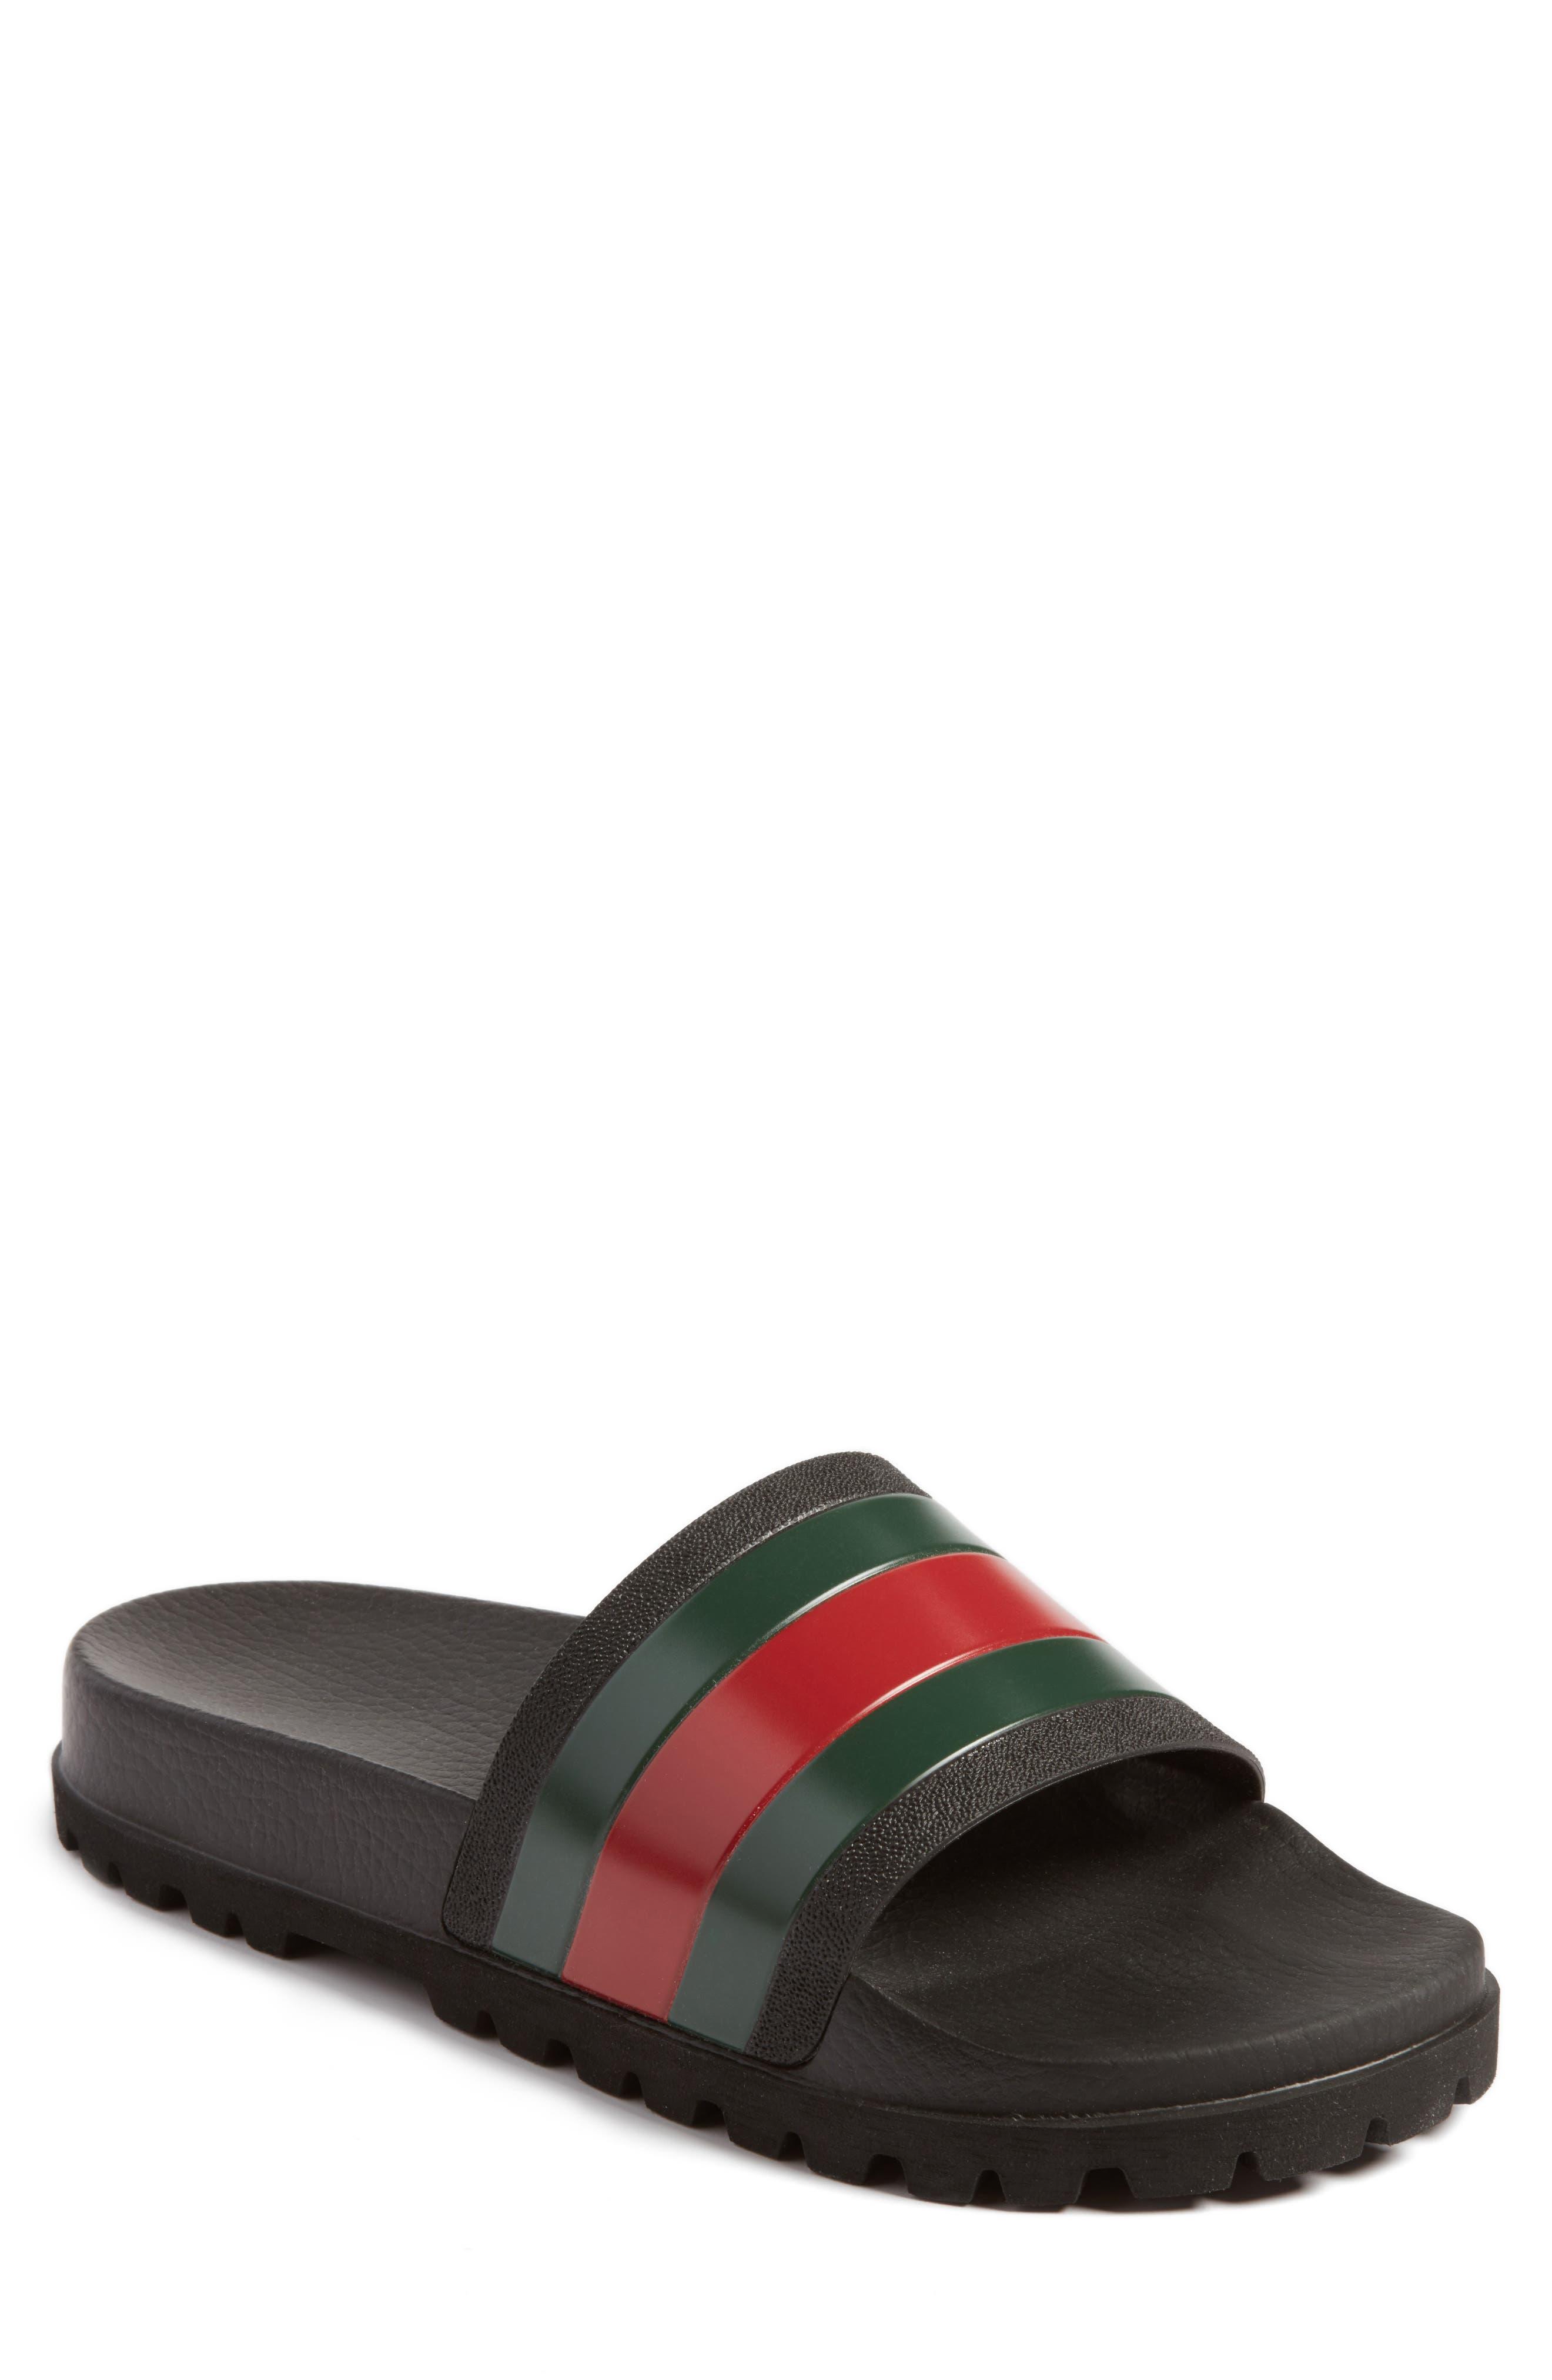 Men\u0027s Gucci Sandals, Slides \u0026 Flip,Flops